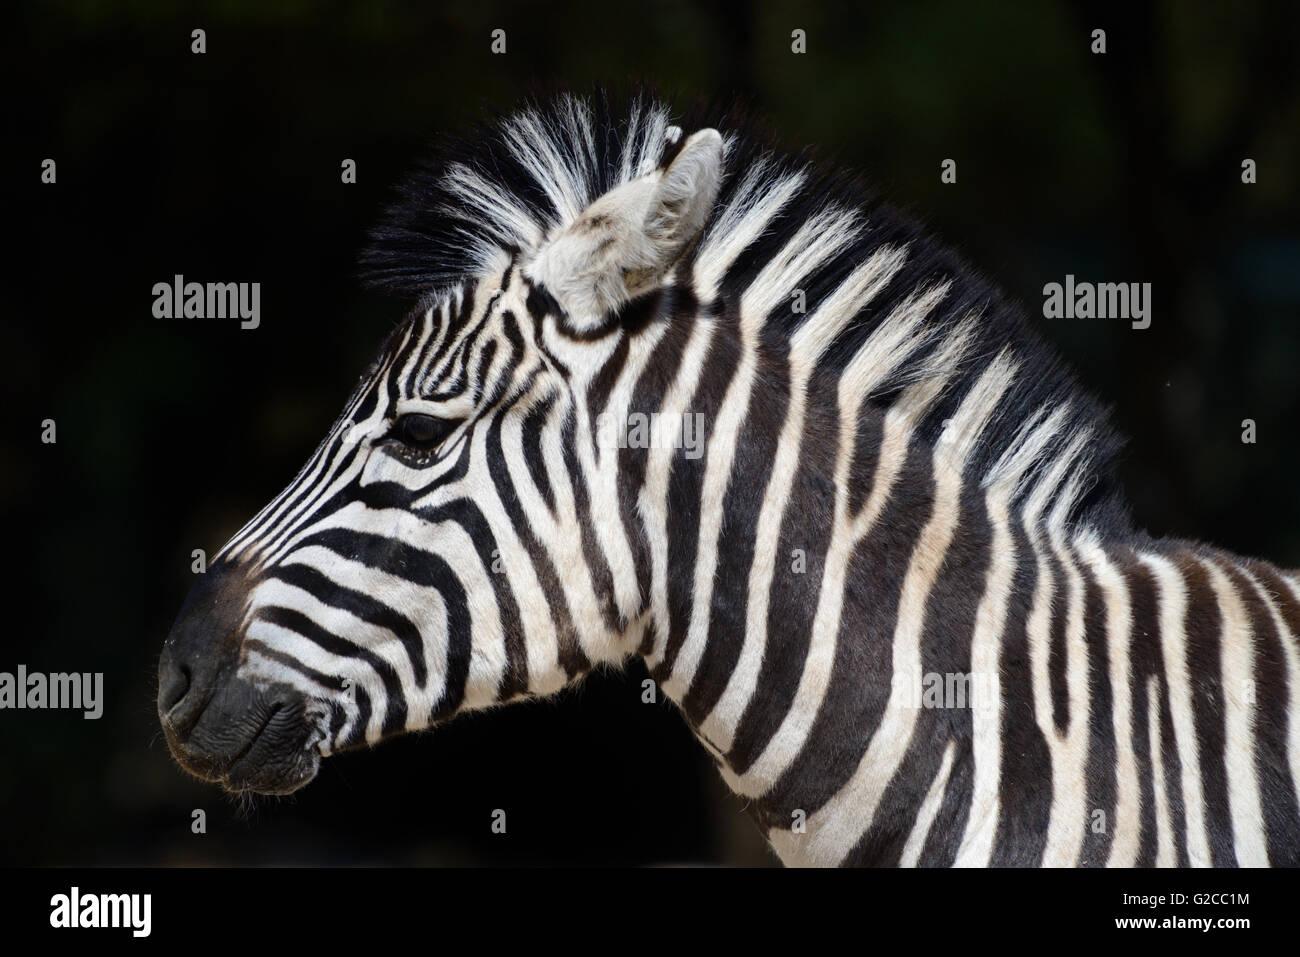 Portrait de le zèbre de Burchell (Equus quagga burchellii) Photo Stock